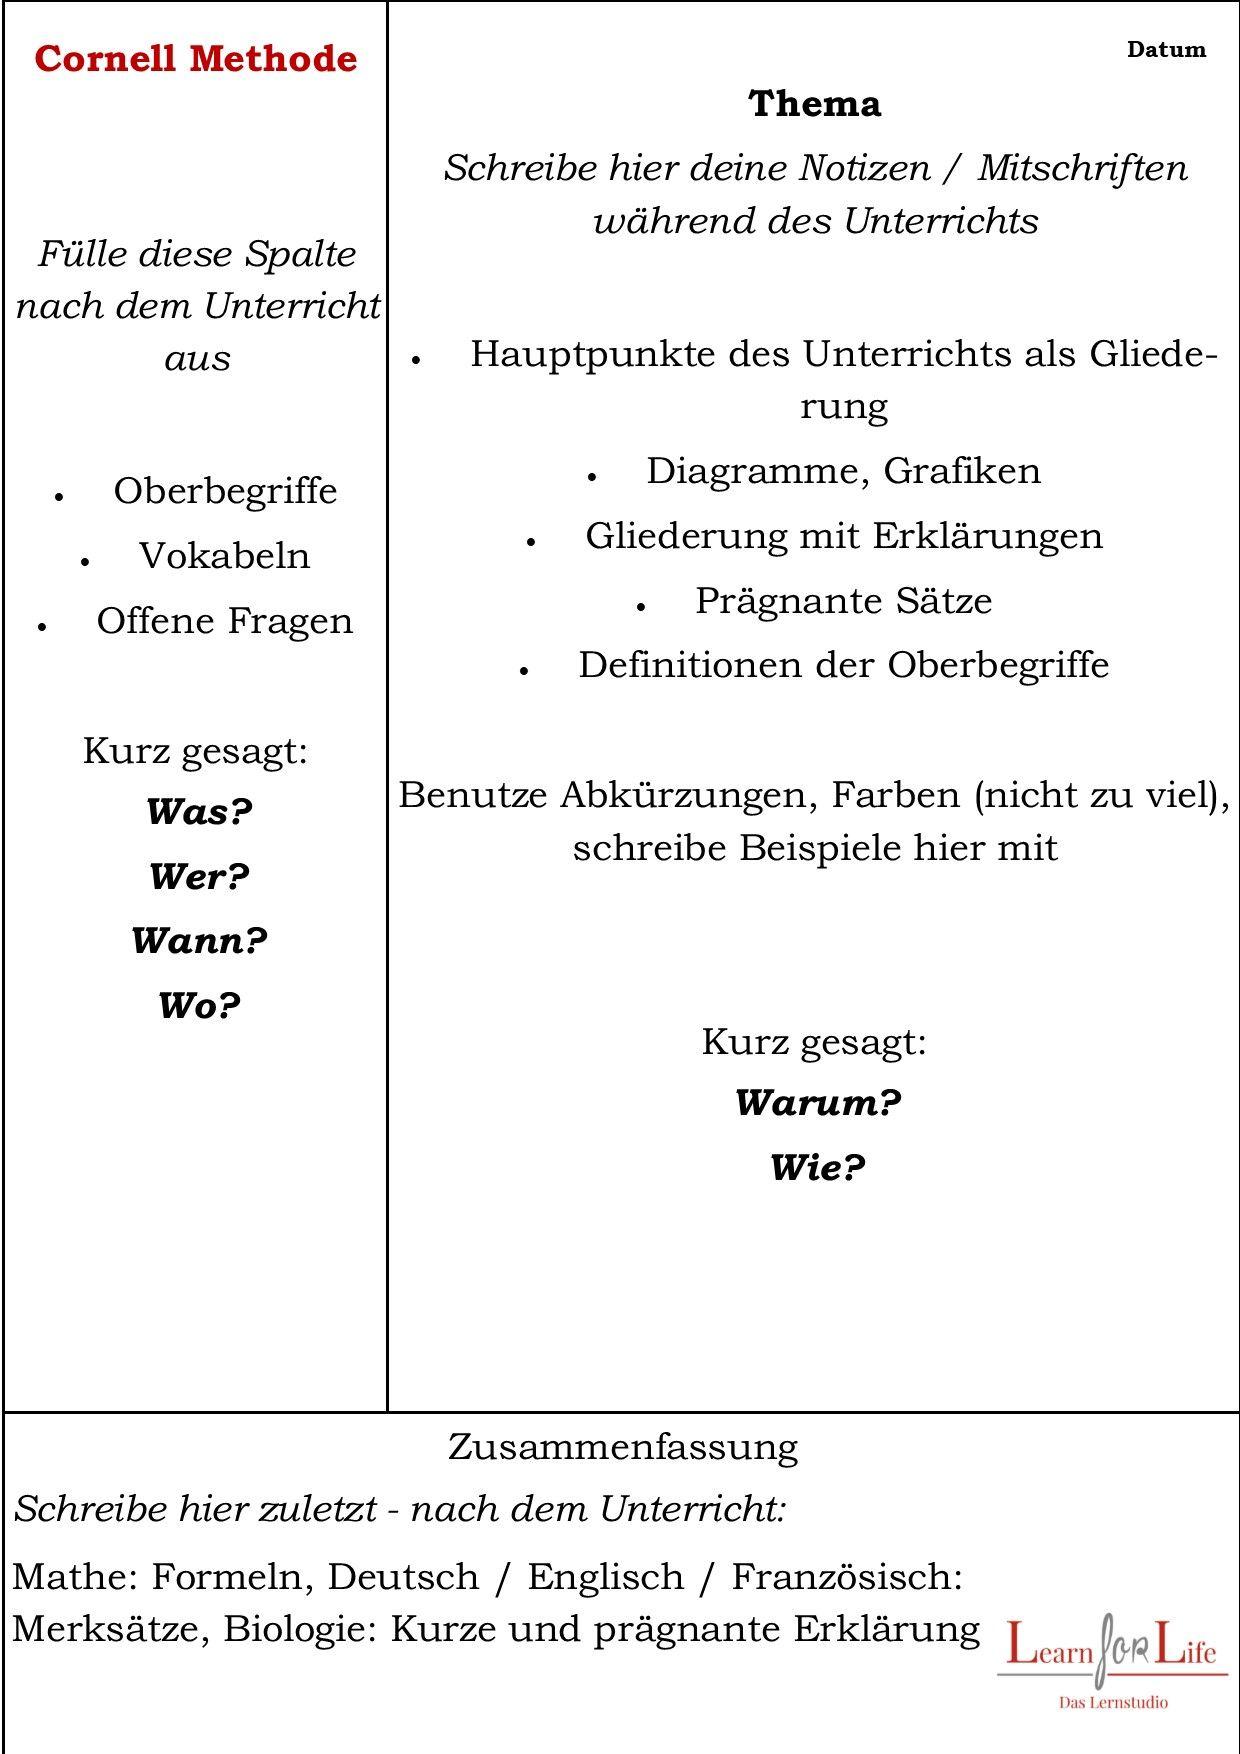 Cornell Methode Notizen